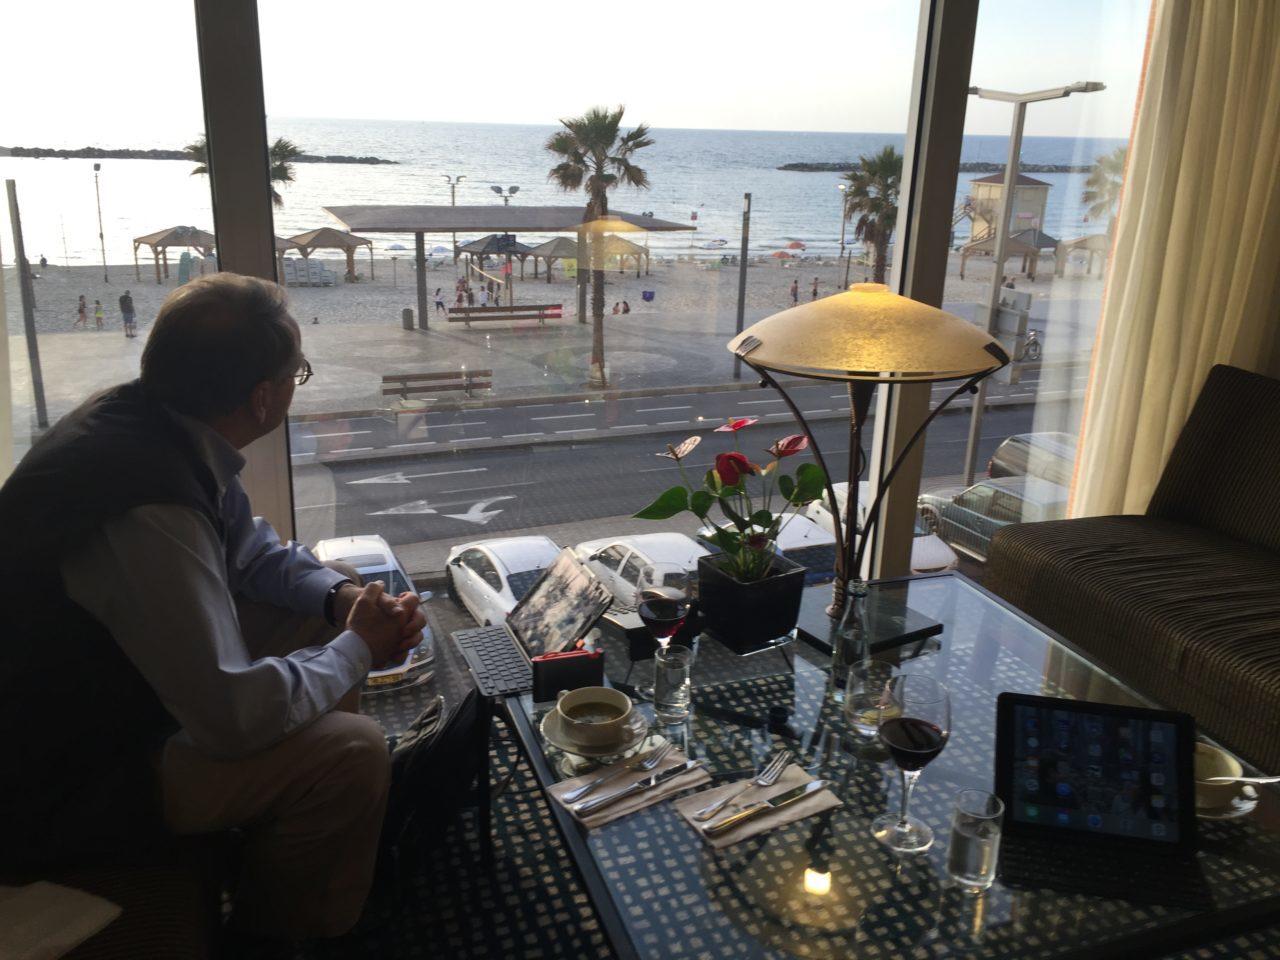 Vacationing in Israel ... Enjoying the sunset at the King David Lounge of the Dan Tel Aviv Hotel